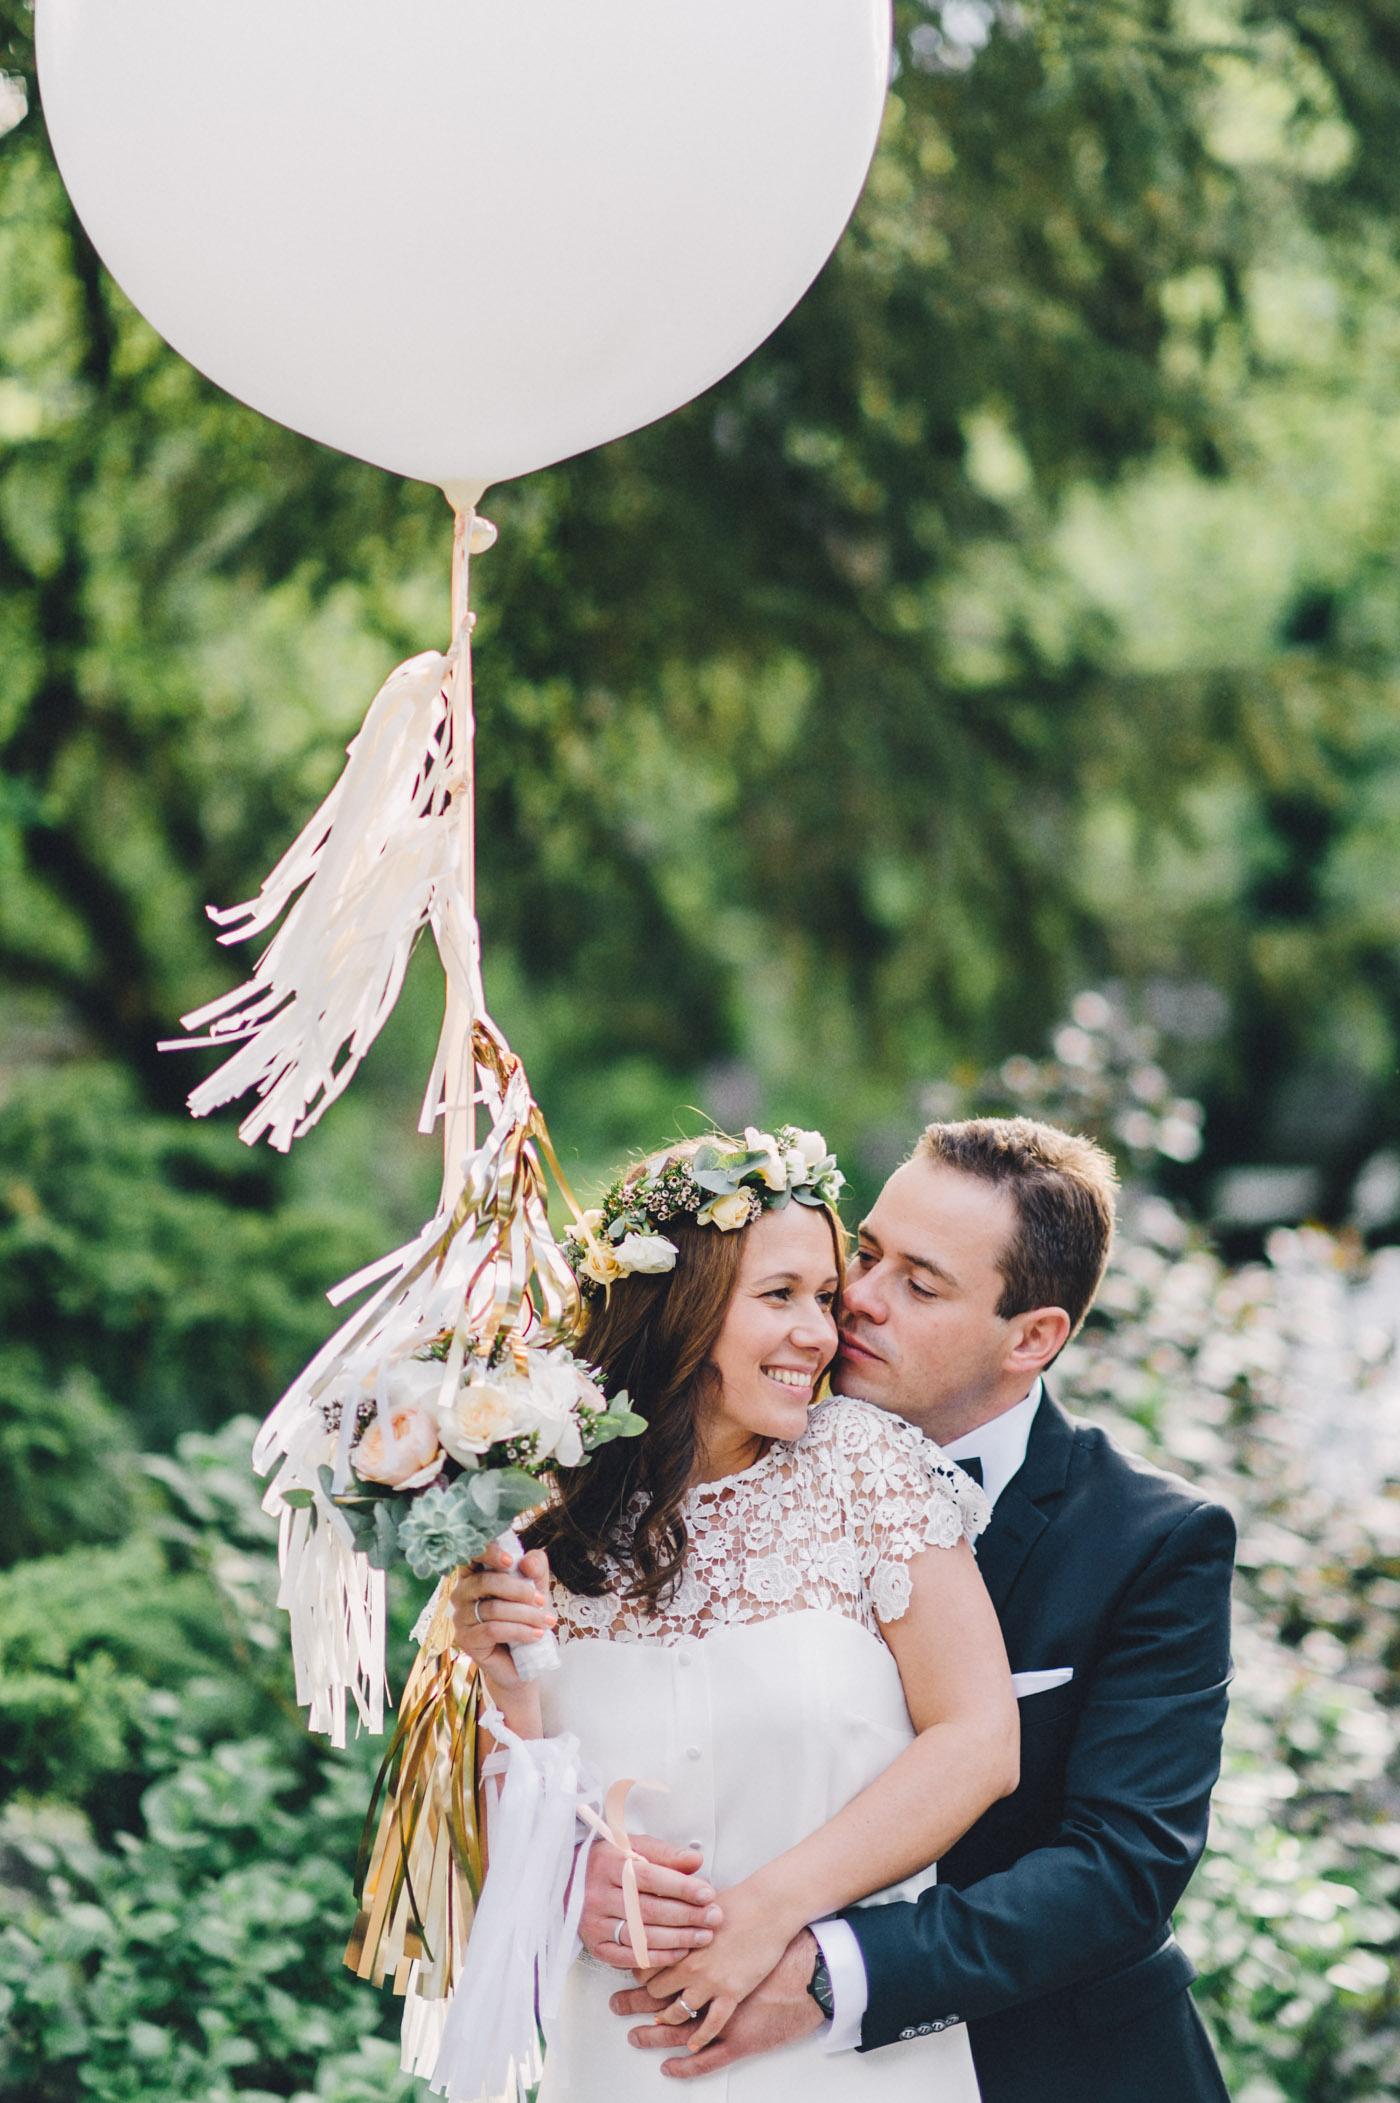 diy-wedding-nothenhof-hoch-5